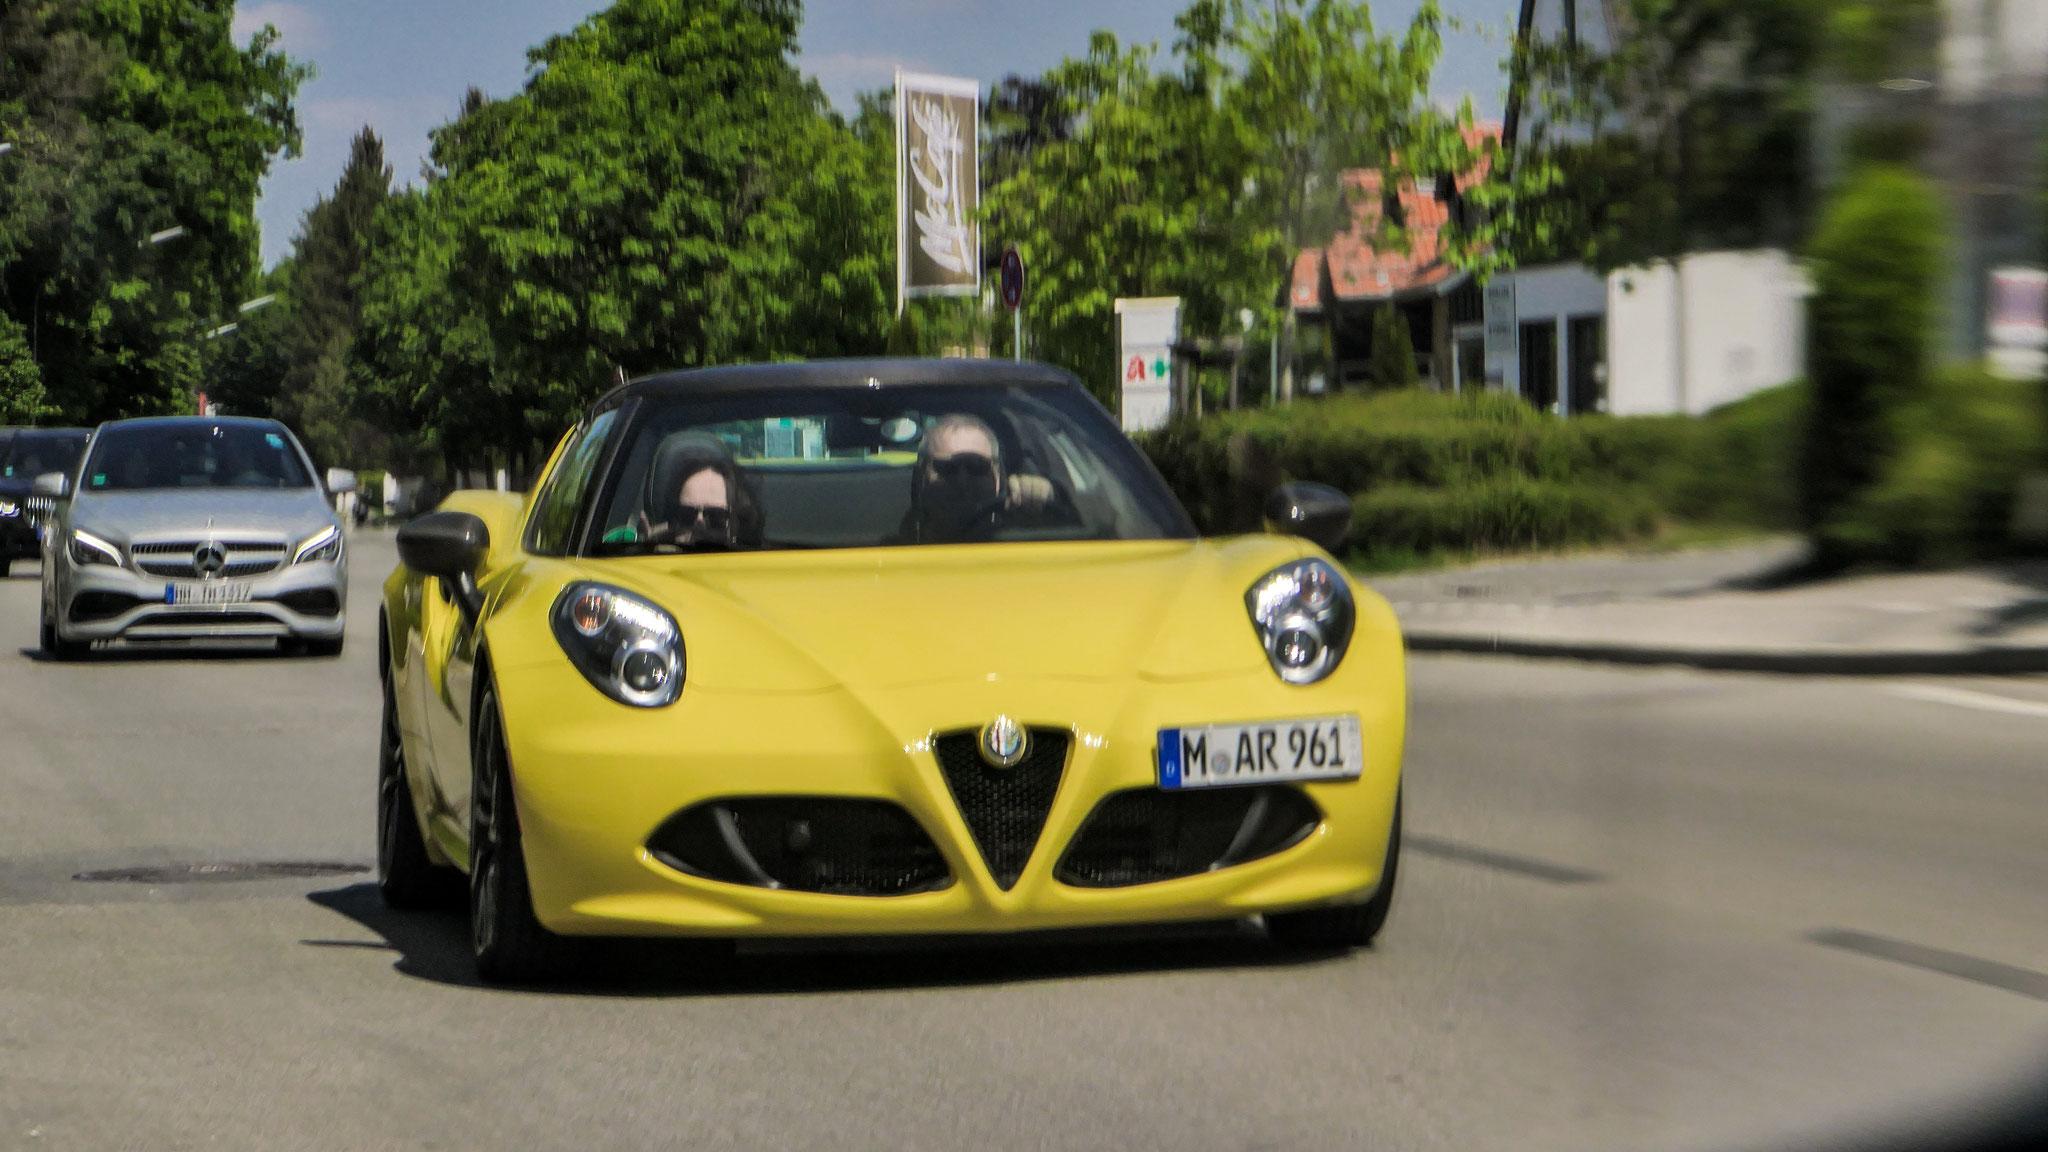 Alfa Romeo 4C Spyder - M-AR-961